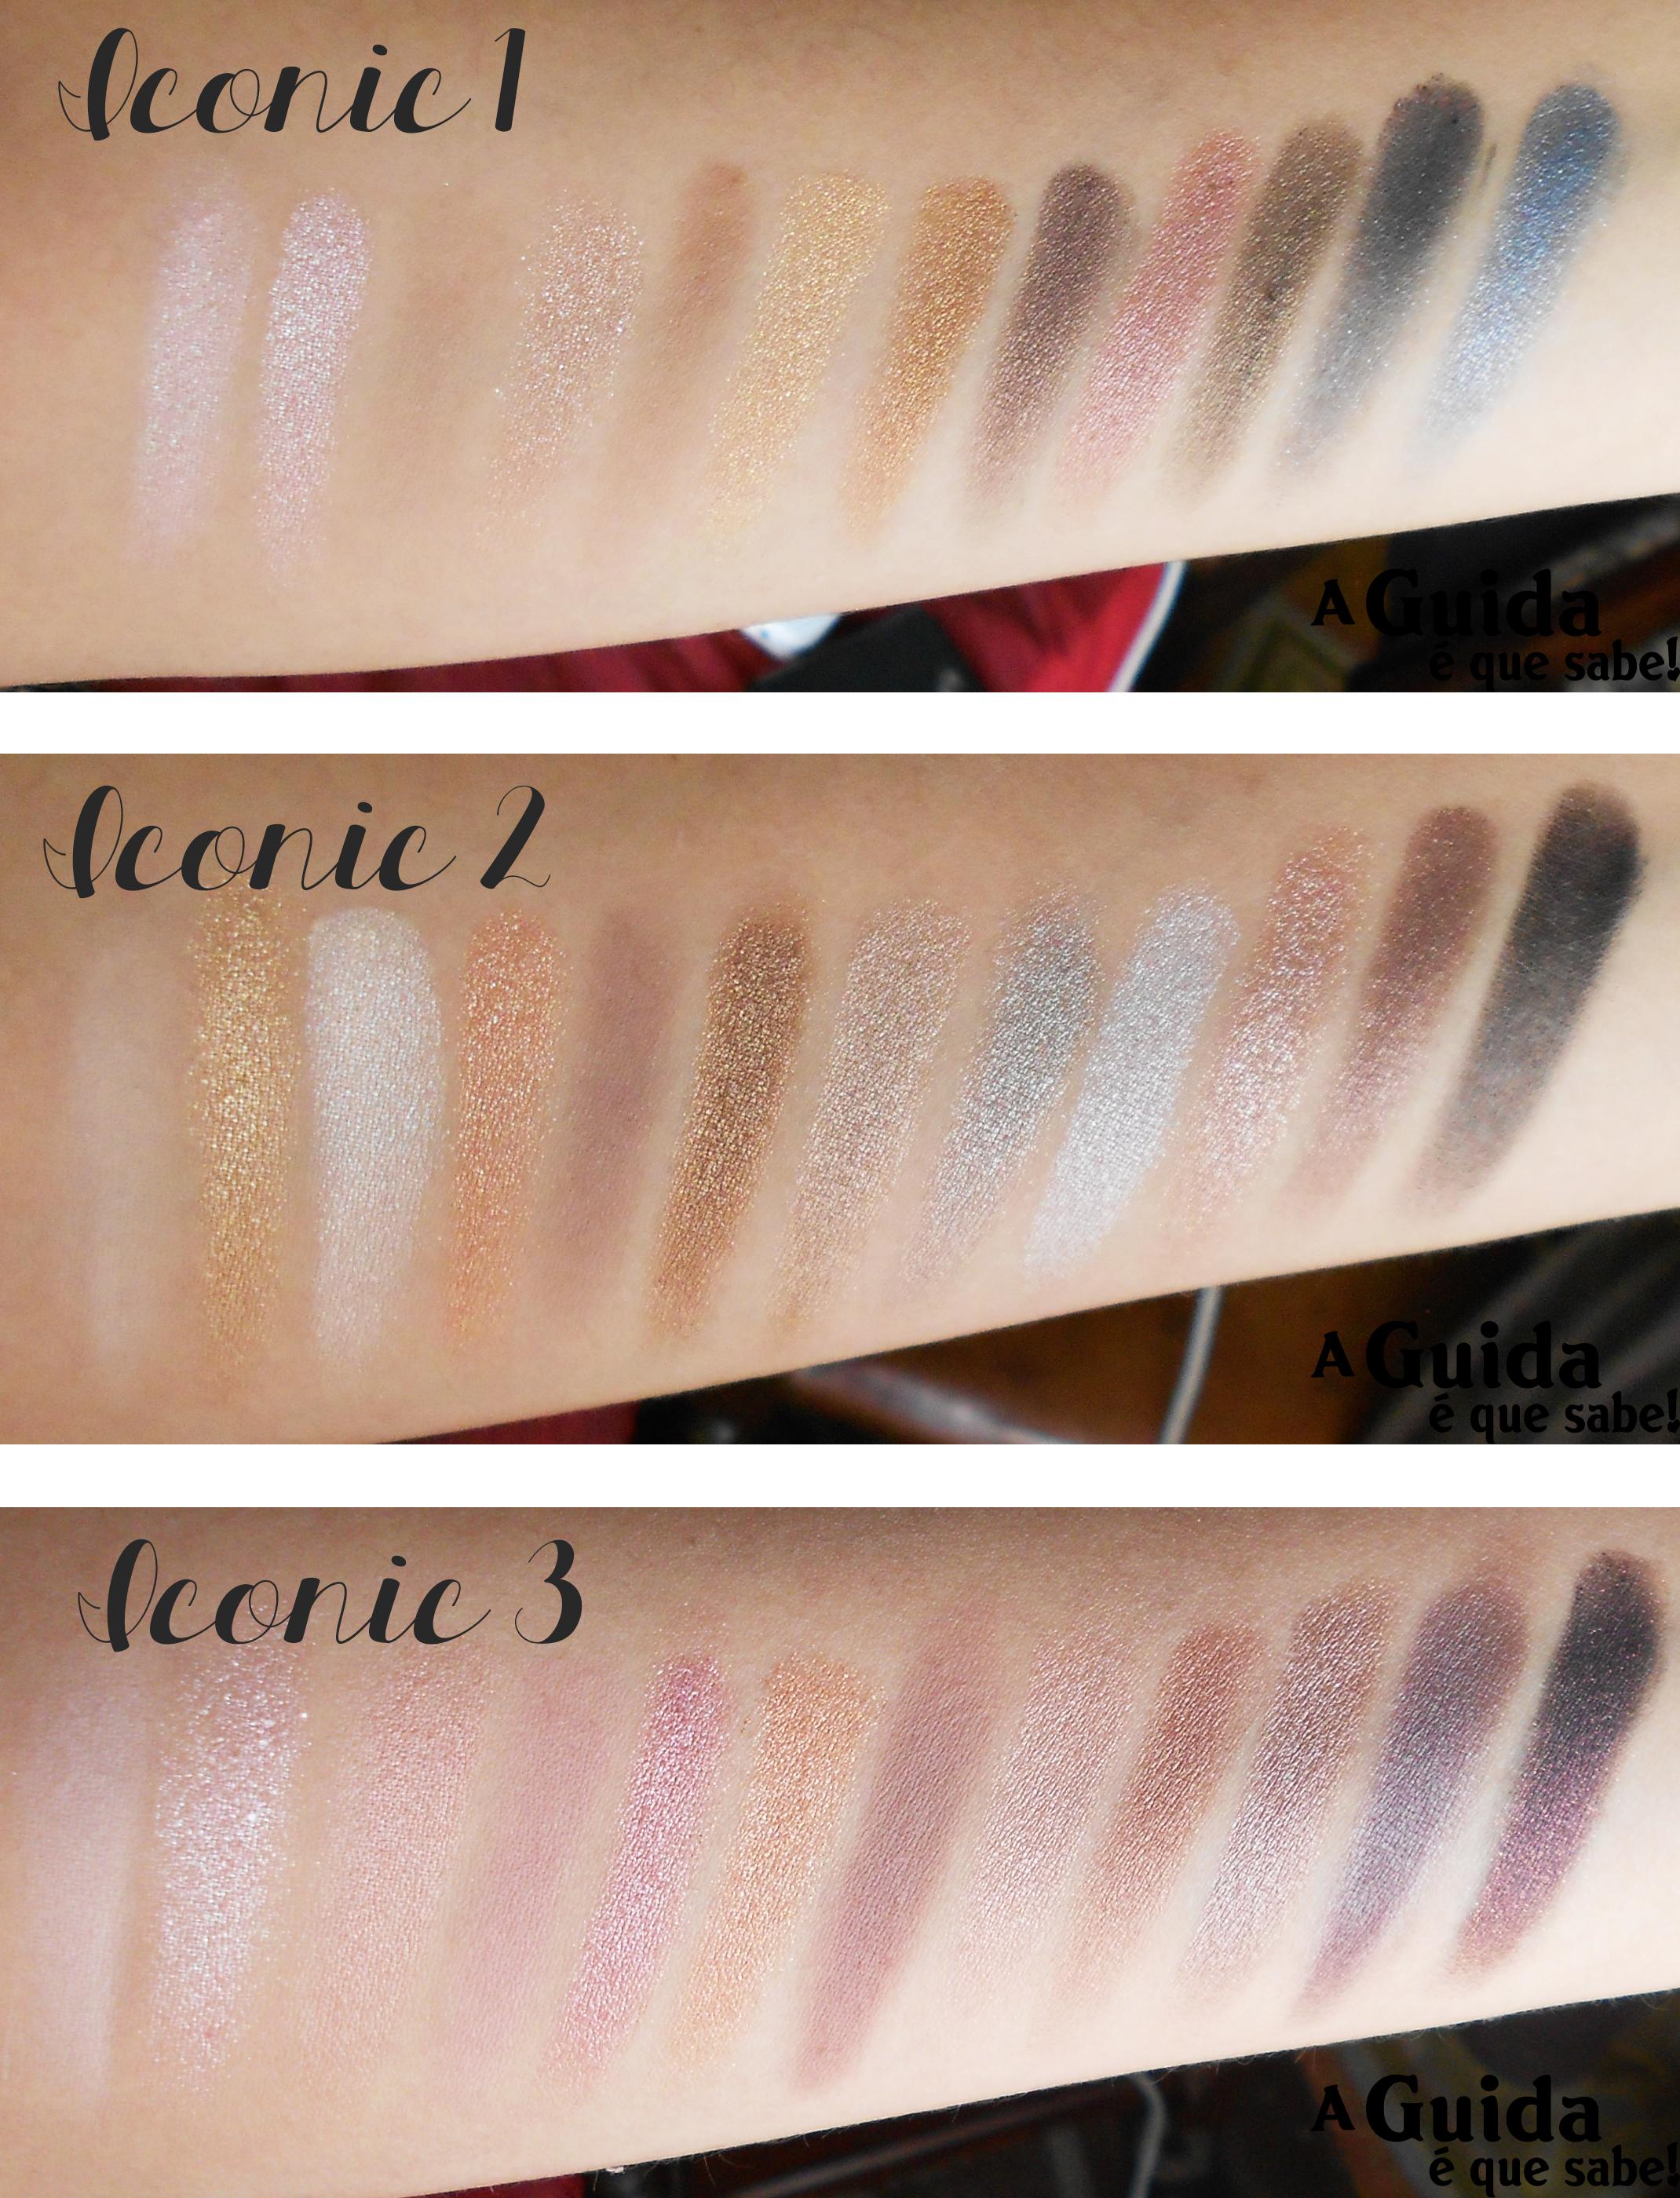 makeup revolution iconic naked urban decay opinião swatch review resenha maquilhagem paleta palete